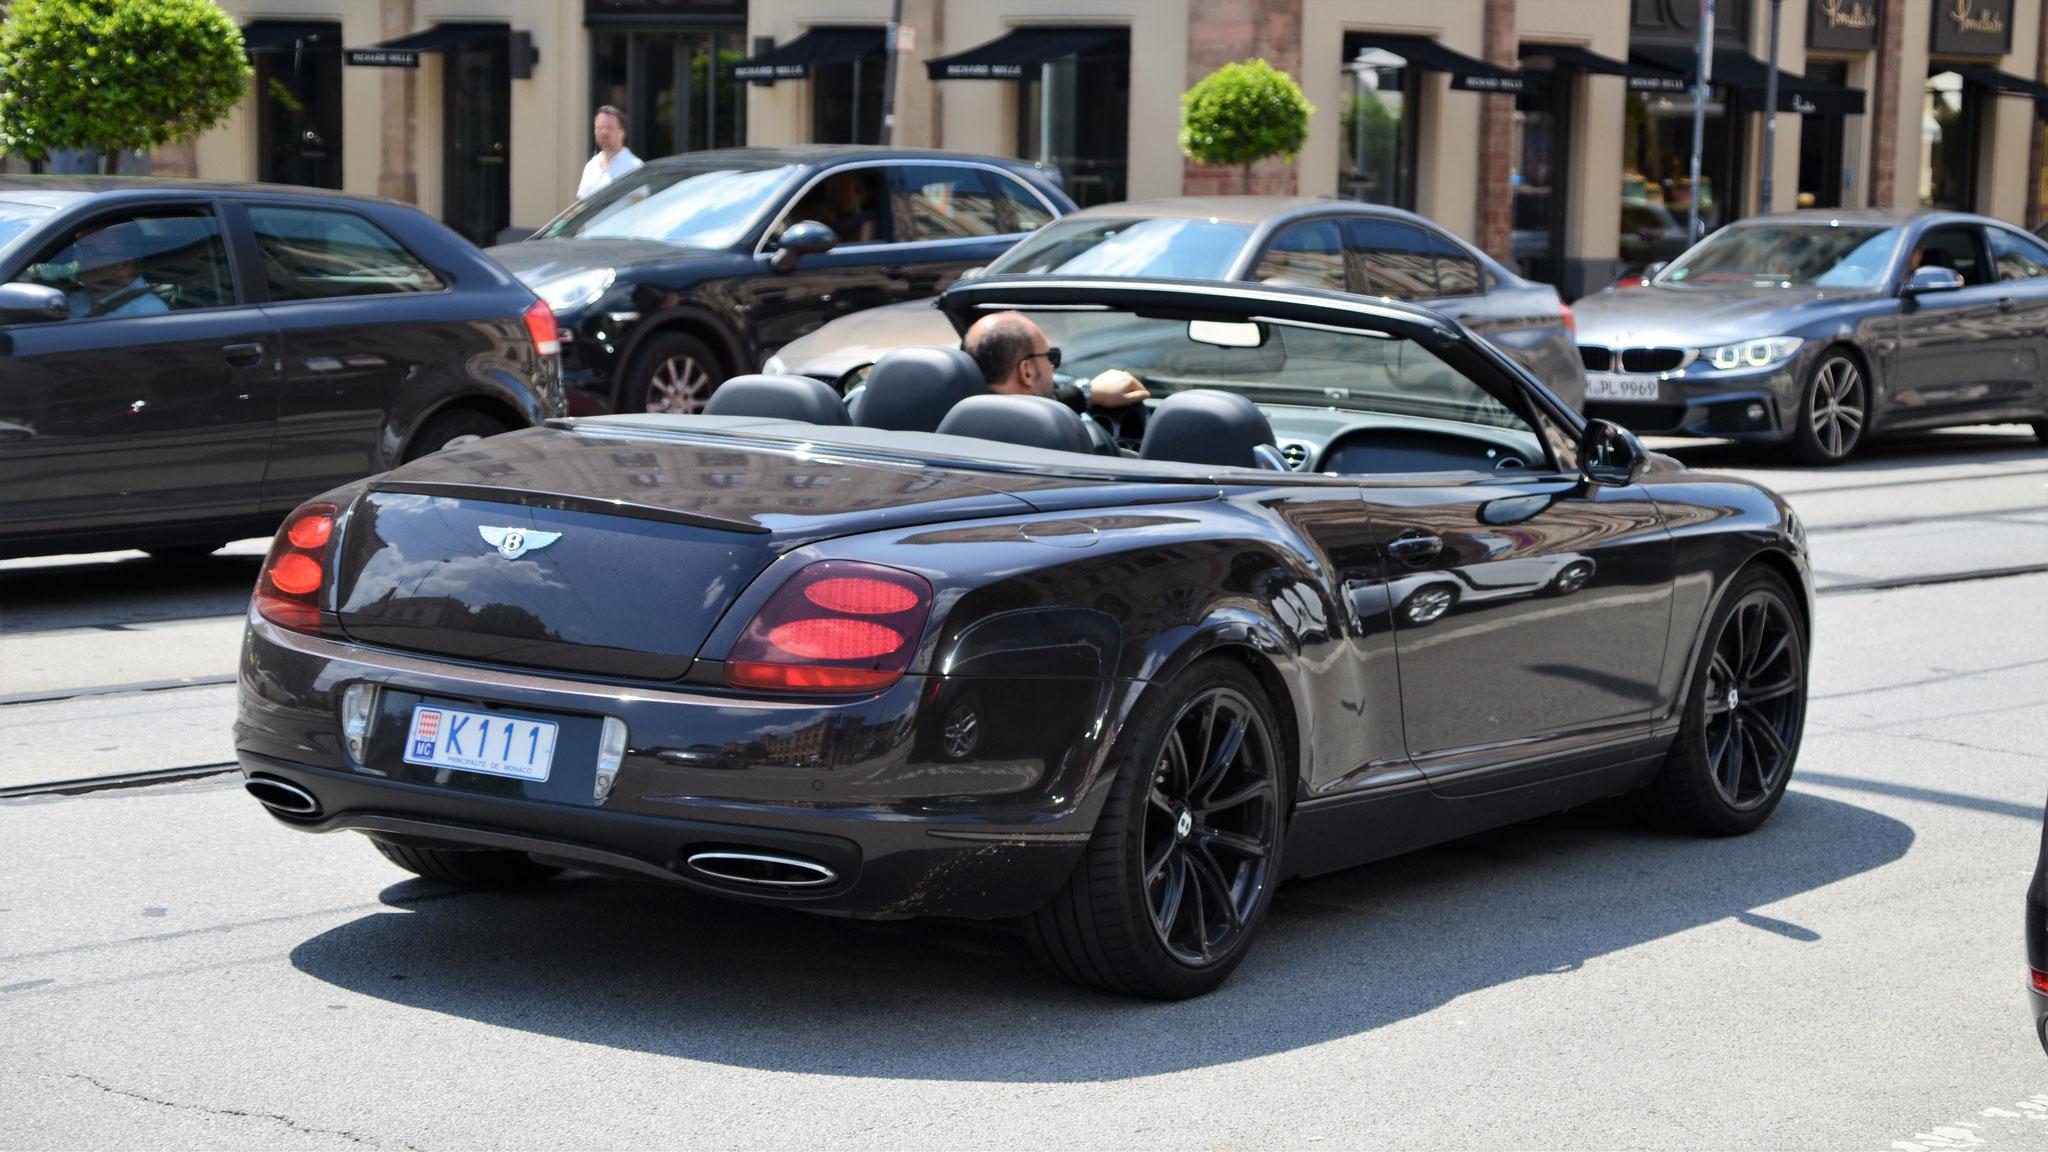 Bentley Continental GTC Supersports - K111 (MC)